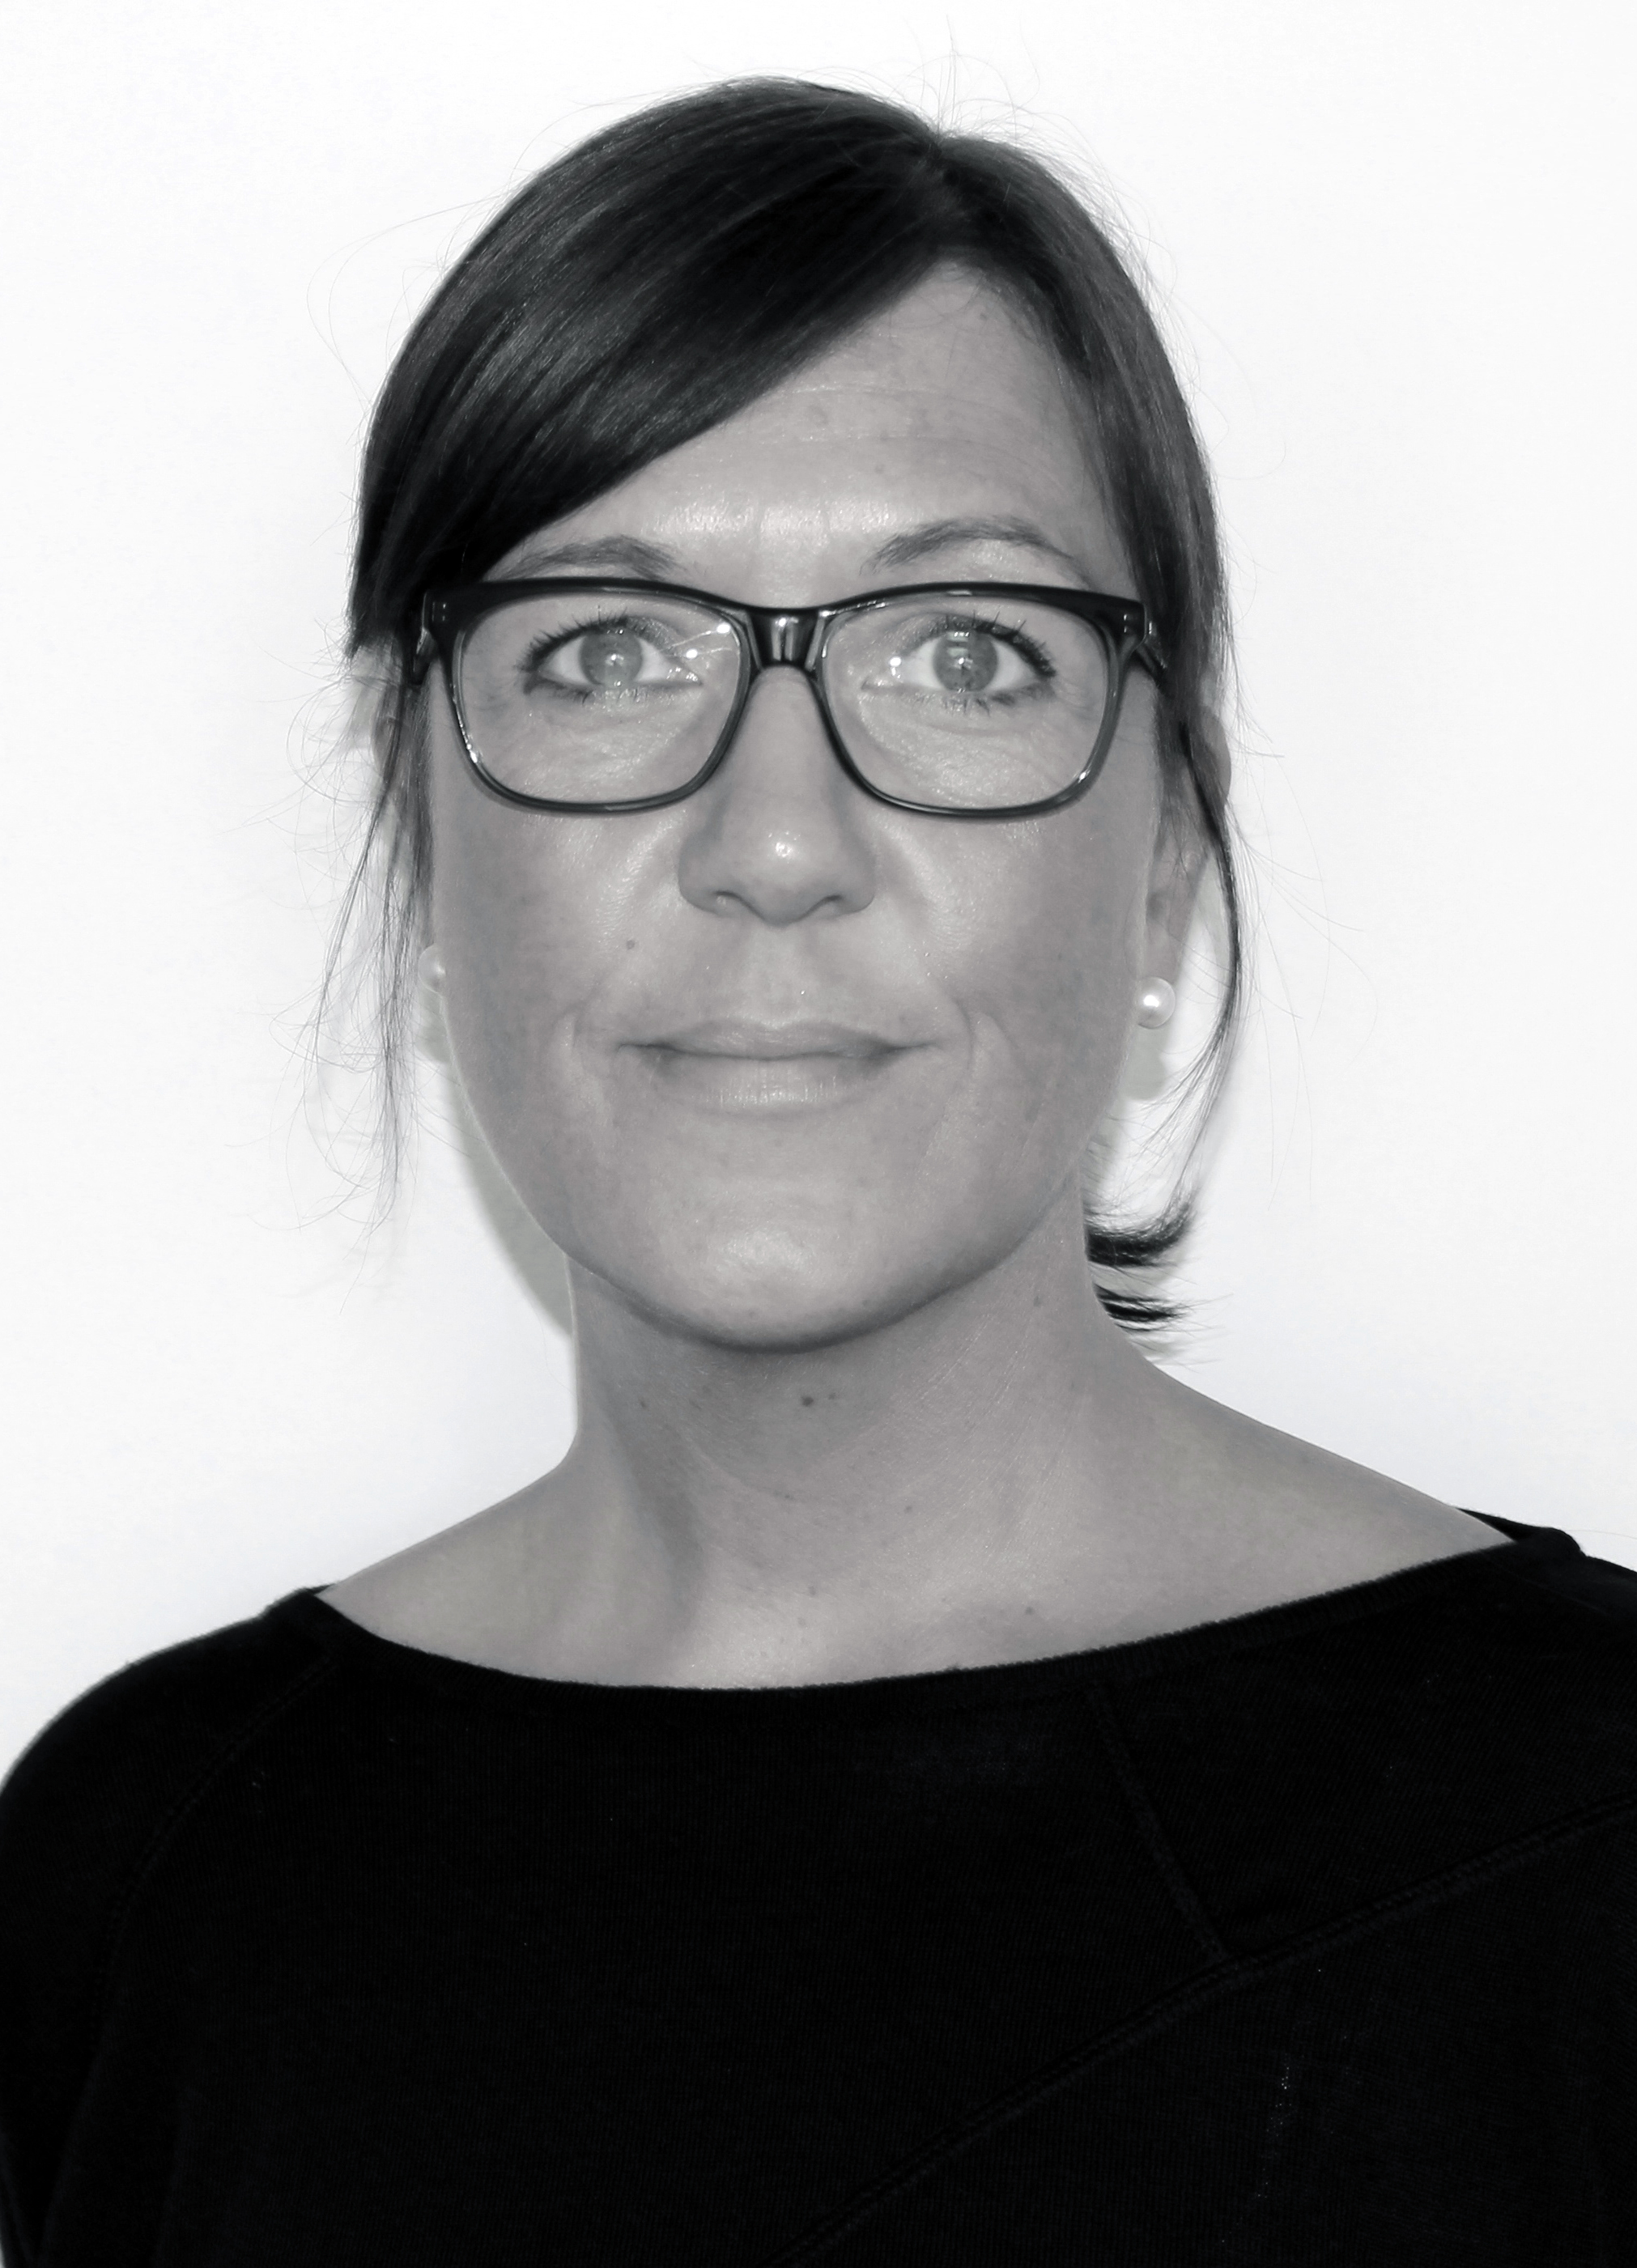 Erfaren detailprofil skal lede Salling Aalborg